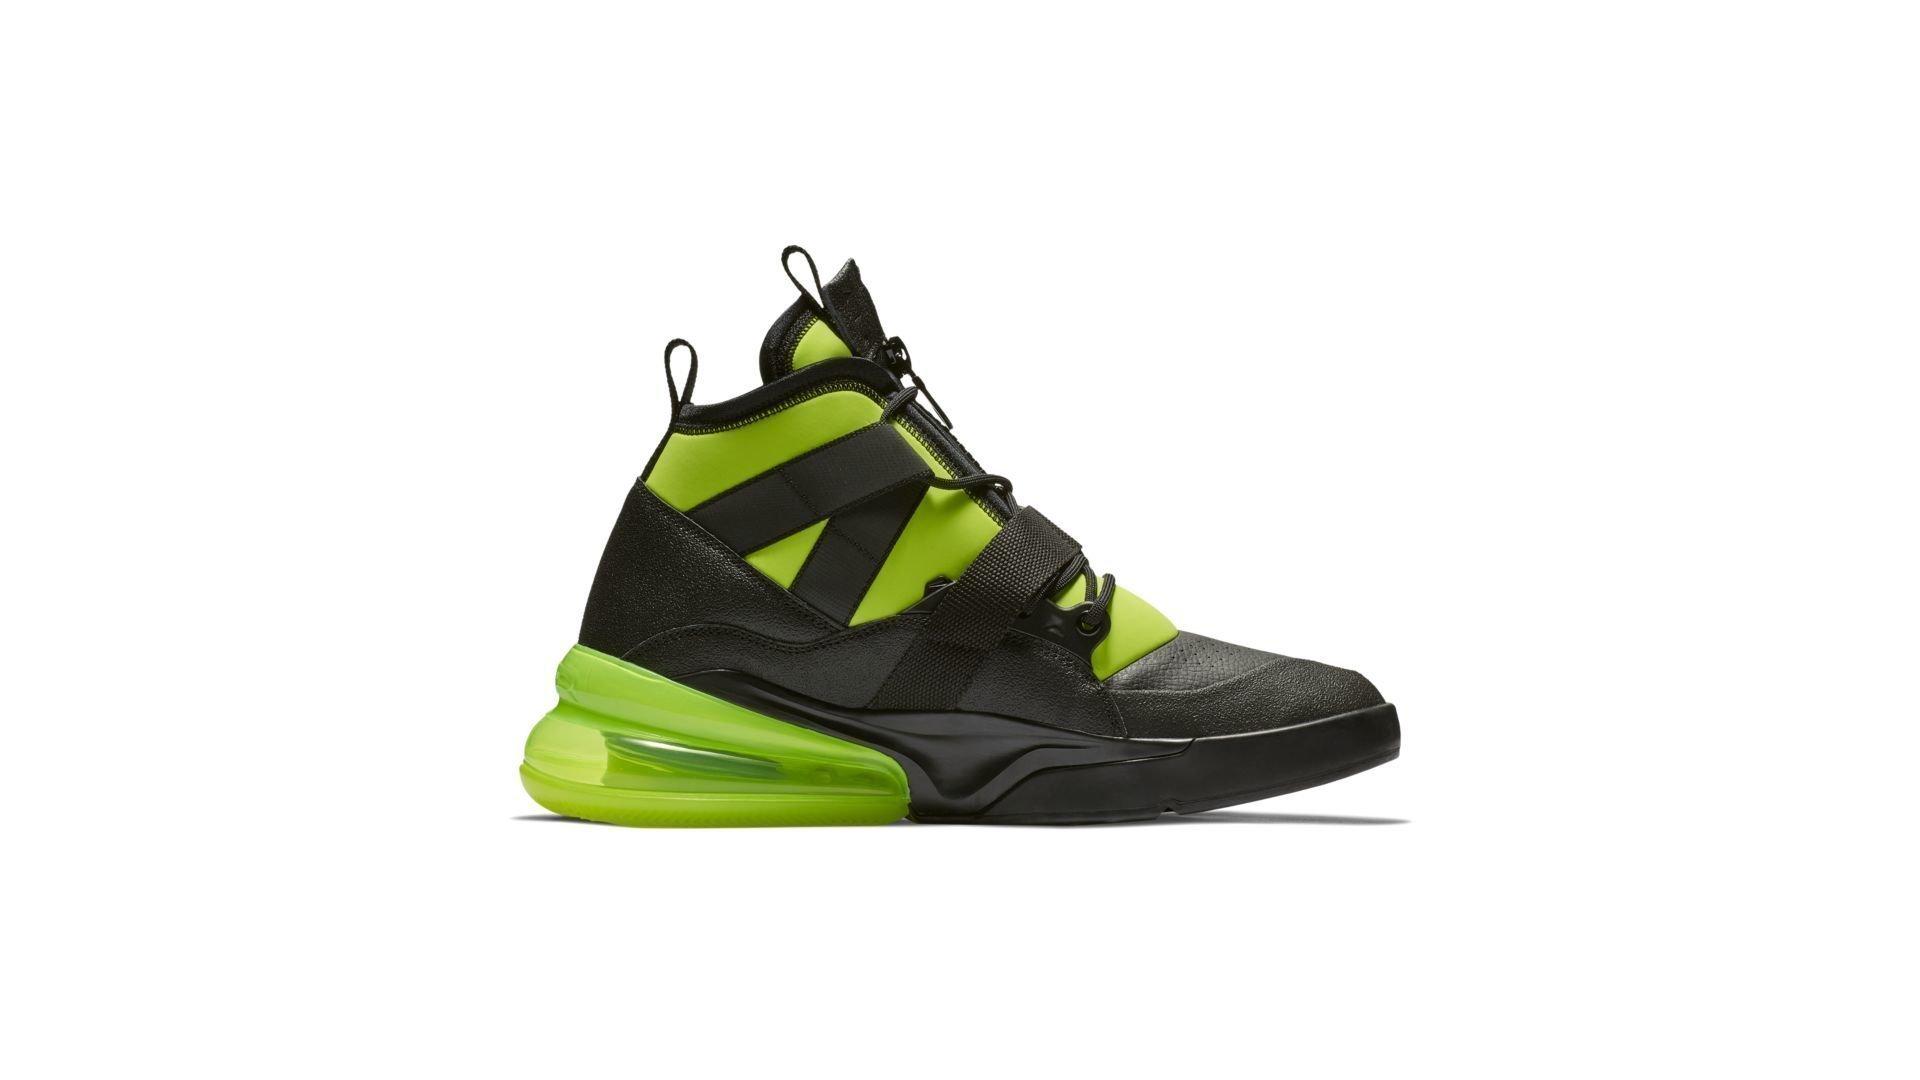 Nike Air Force 270 Utility BlackVolt AQ0572 001